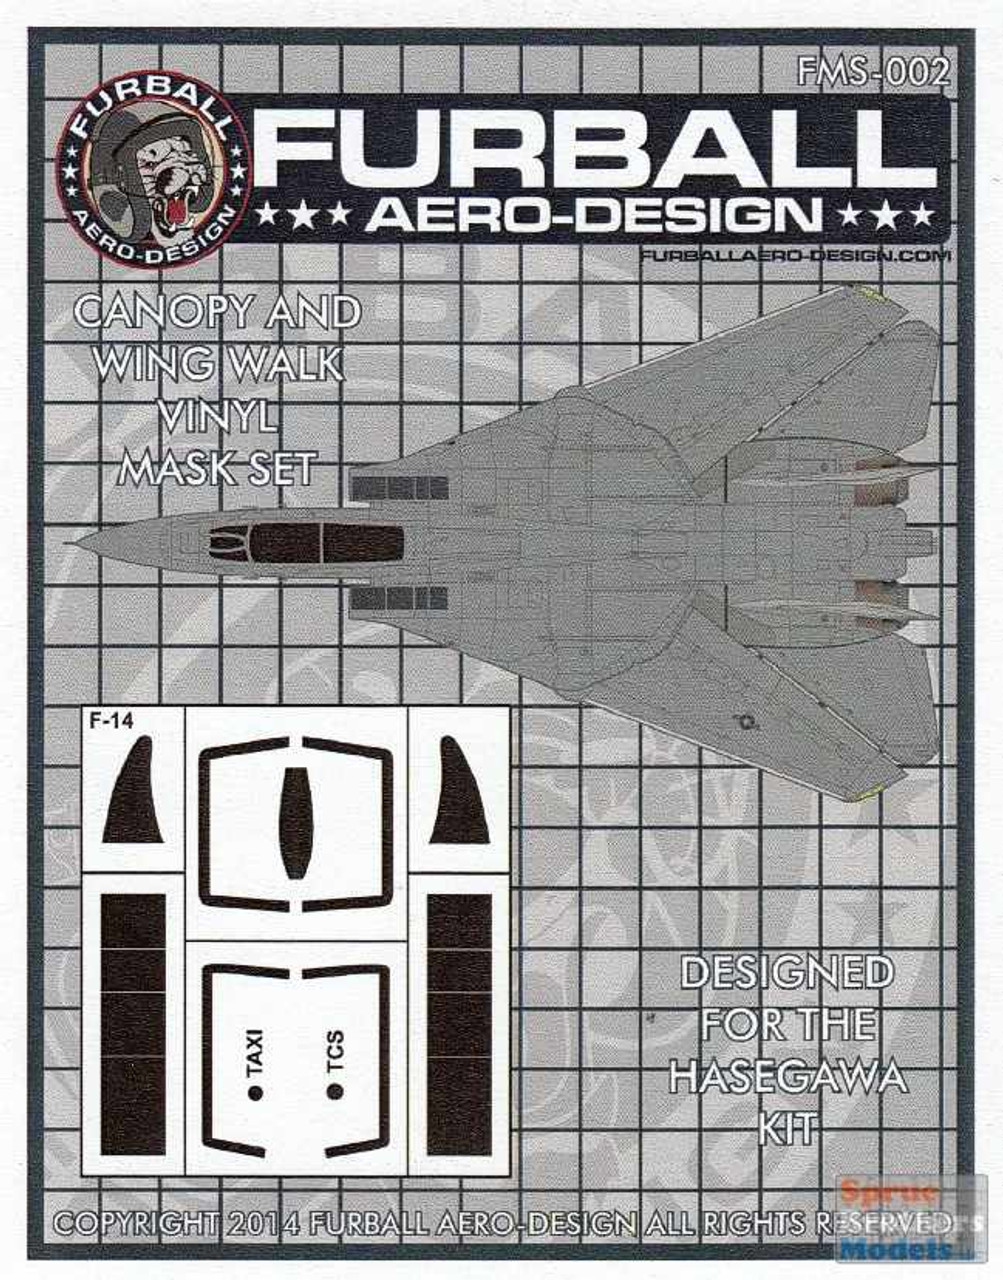 FURFMS002 1:48 Furball Aero Design Canopy & Wing Walk Vinyl Mask Set for F-14 Tomcat (HAS kit)